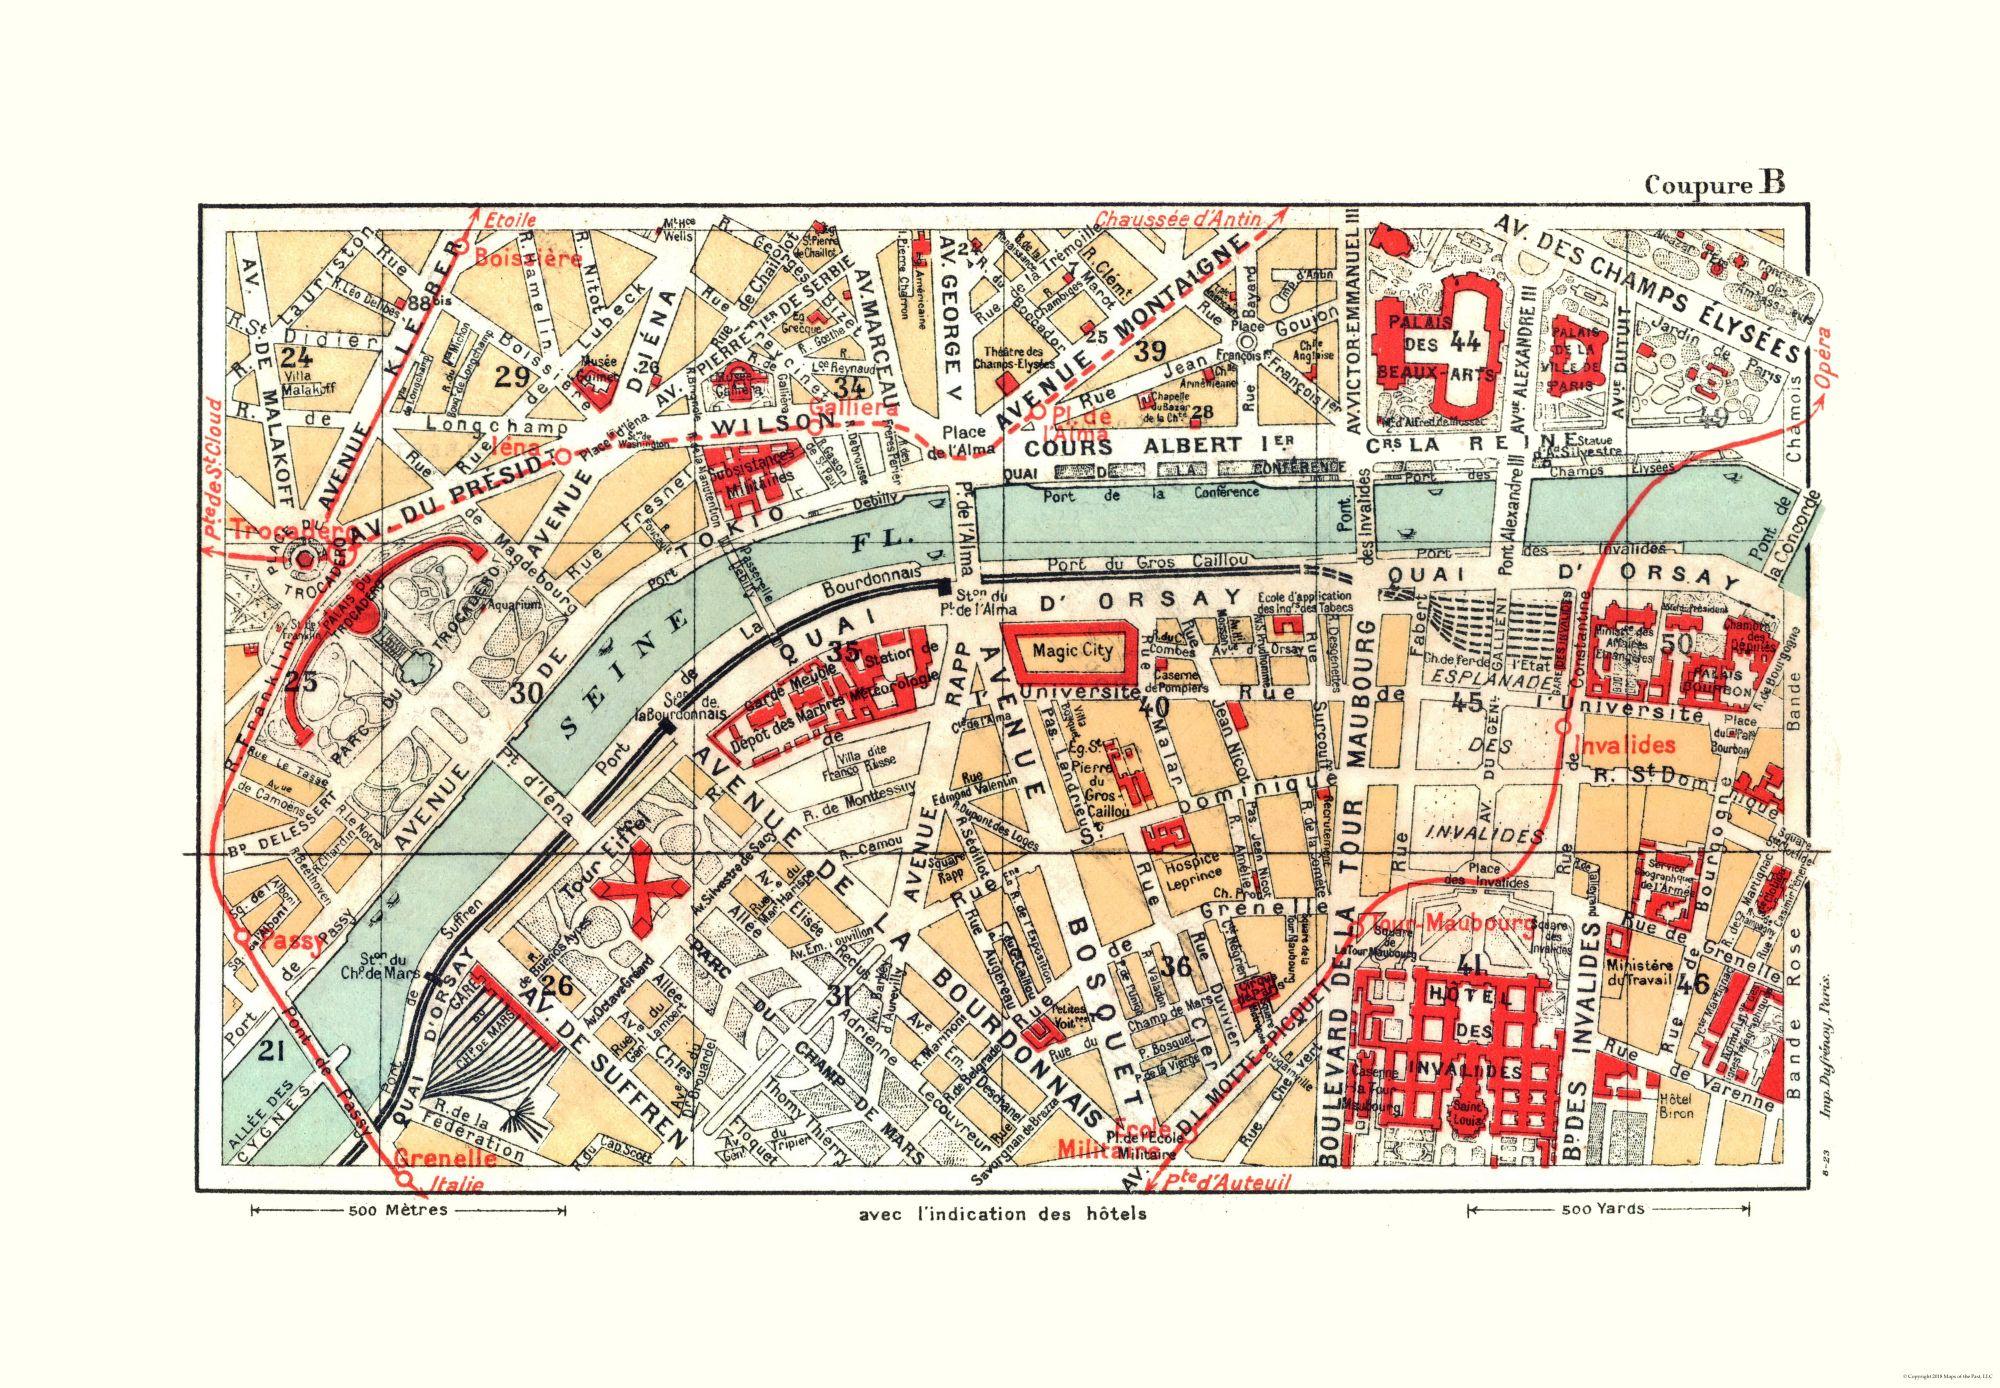 Map Of France Eiffel Tower.International Map Eiffel Tower Paris Blue Guides 1921 33 15 X 23